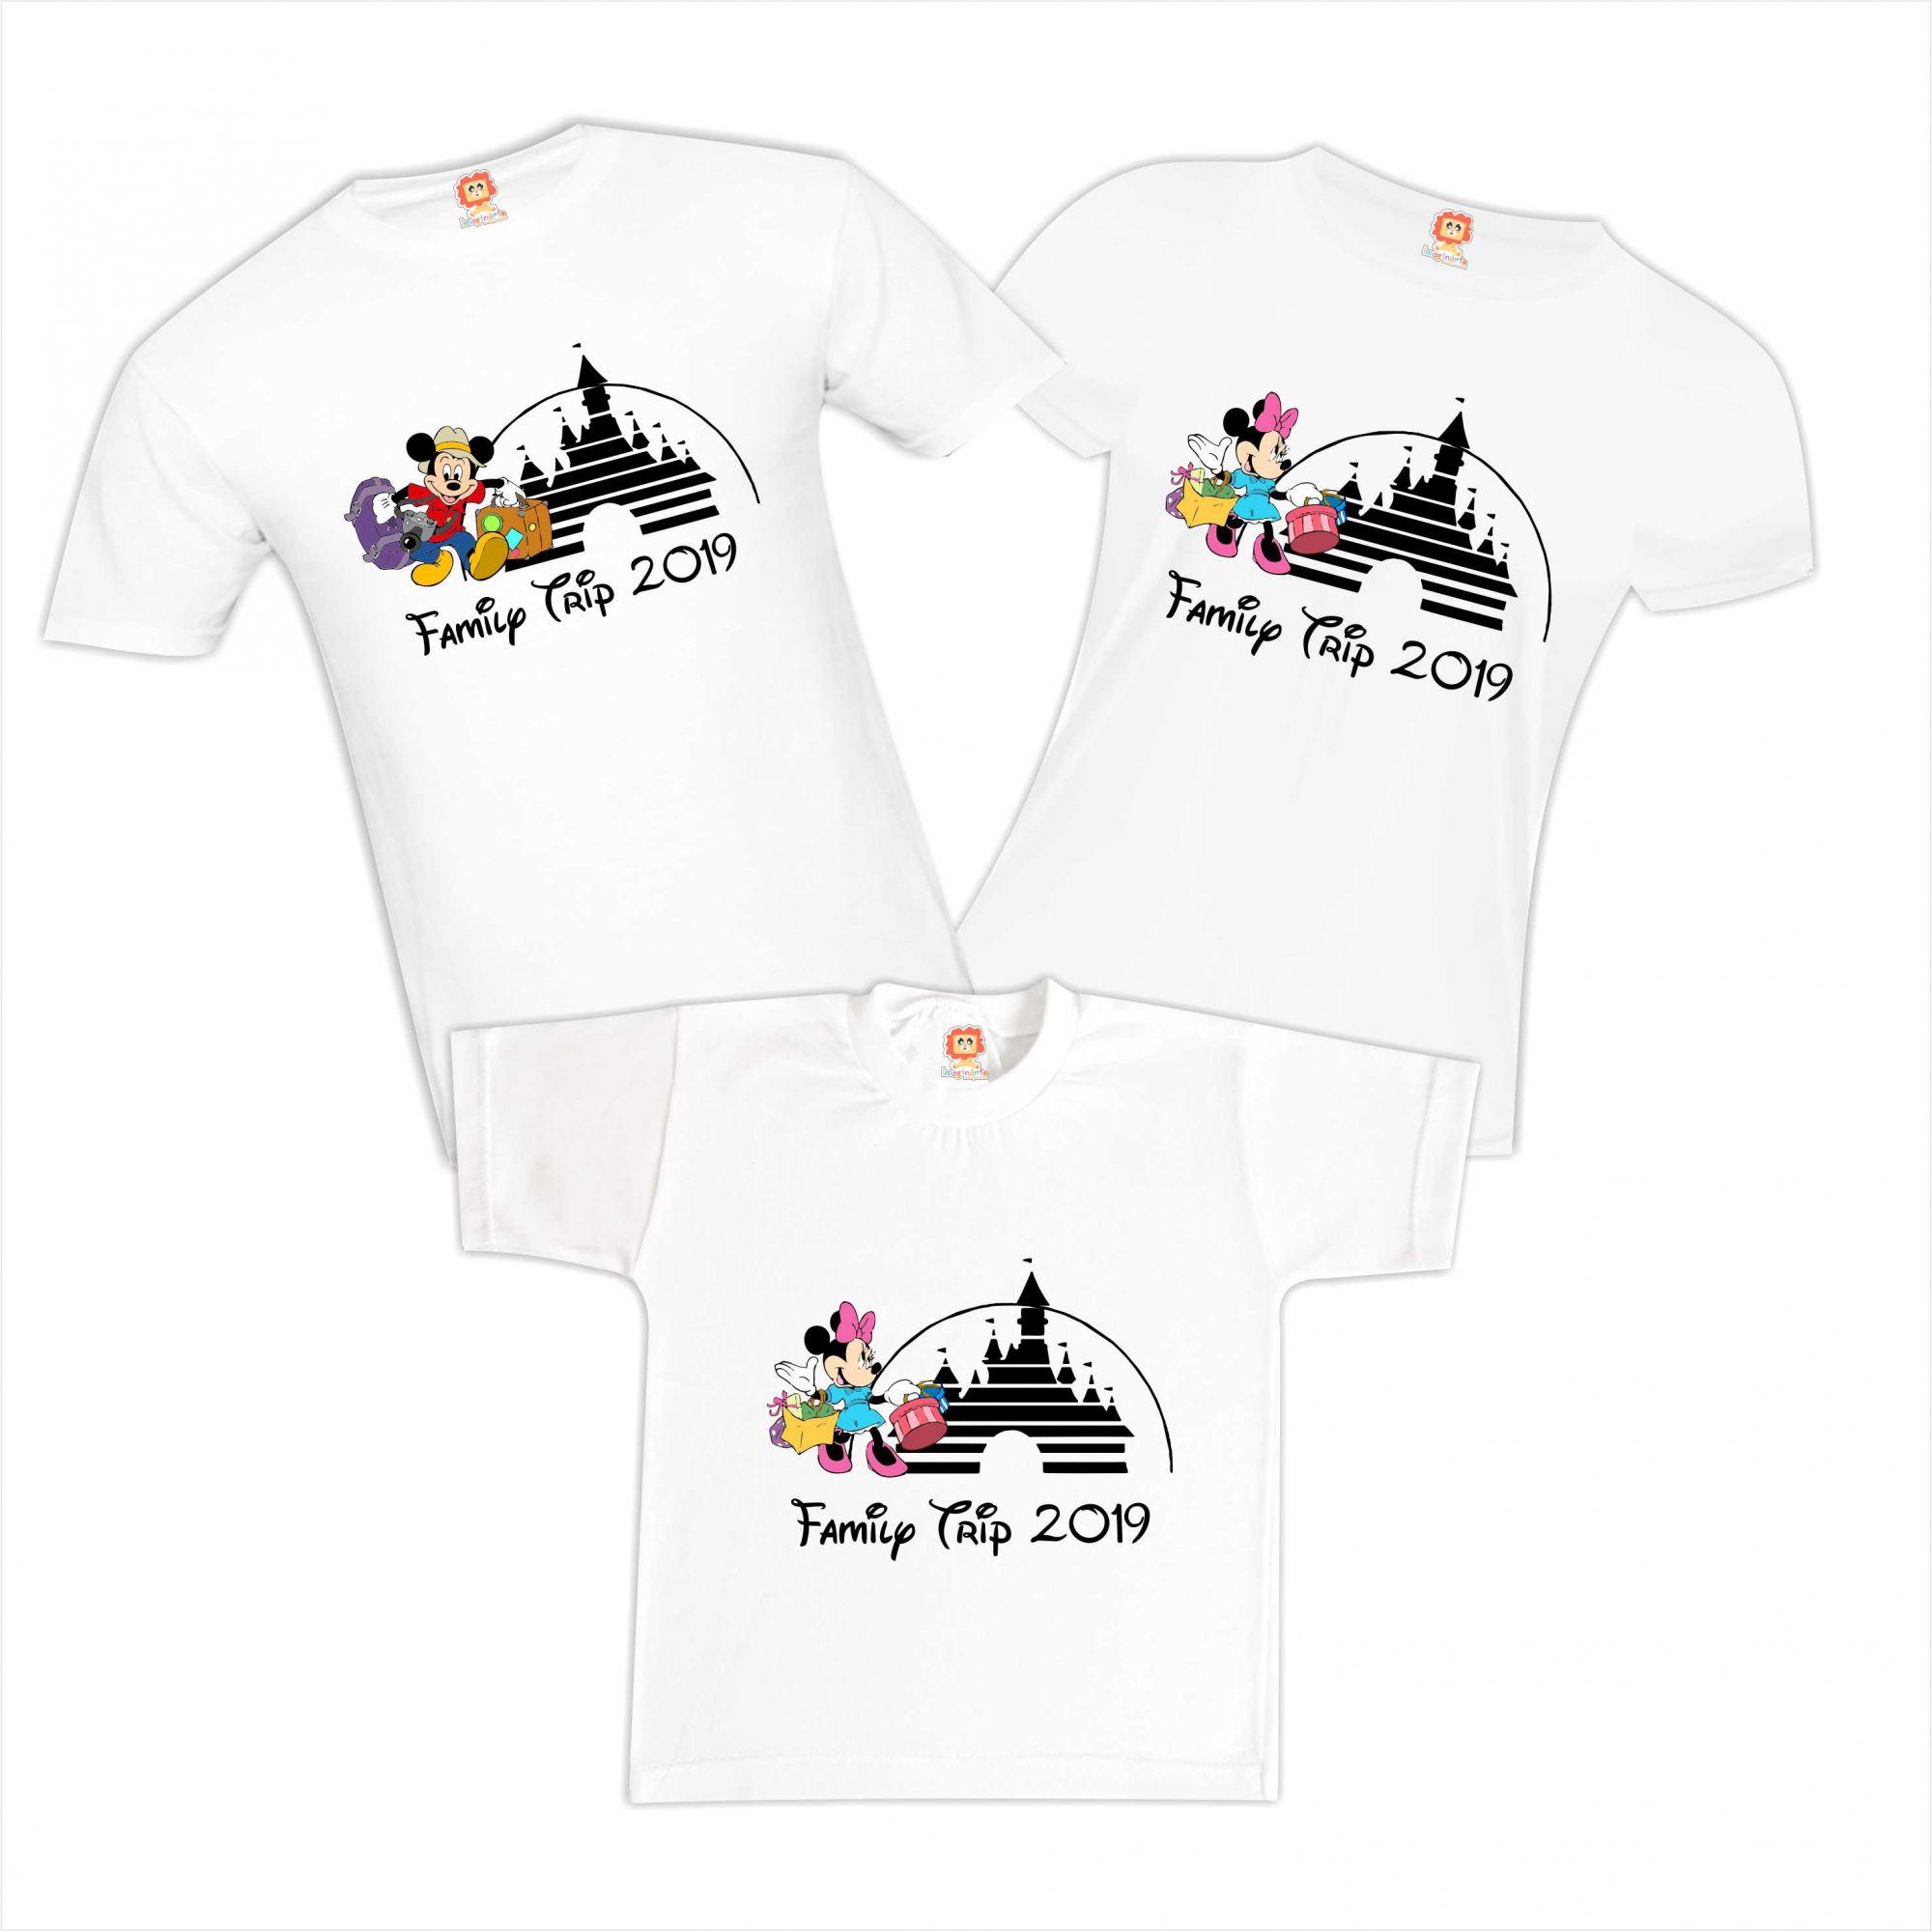 Kit Camisetas Viagem Disney Mickey e Minnie Family Trip Orlando Personalizadas